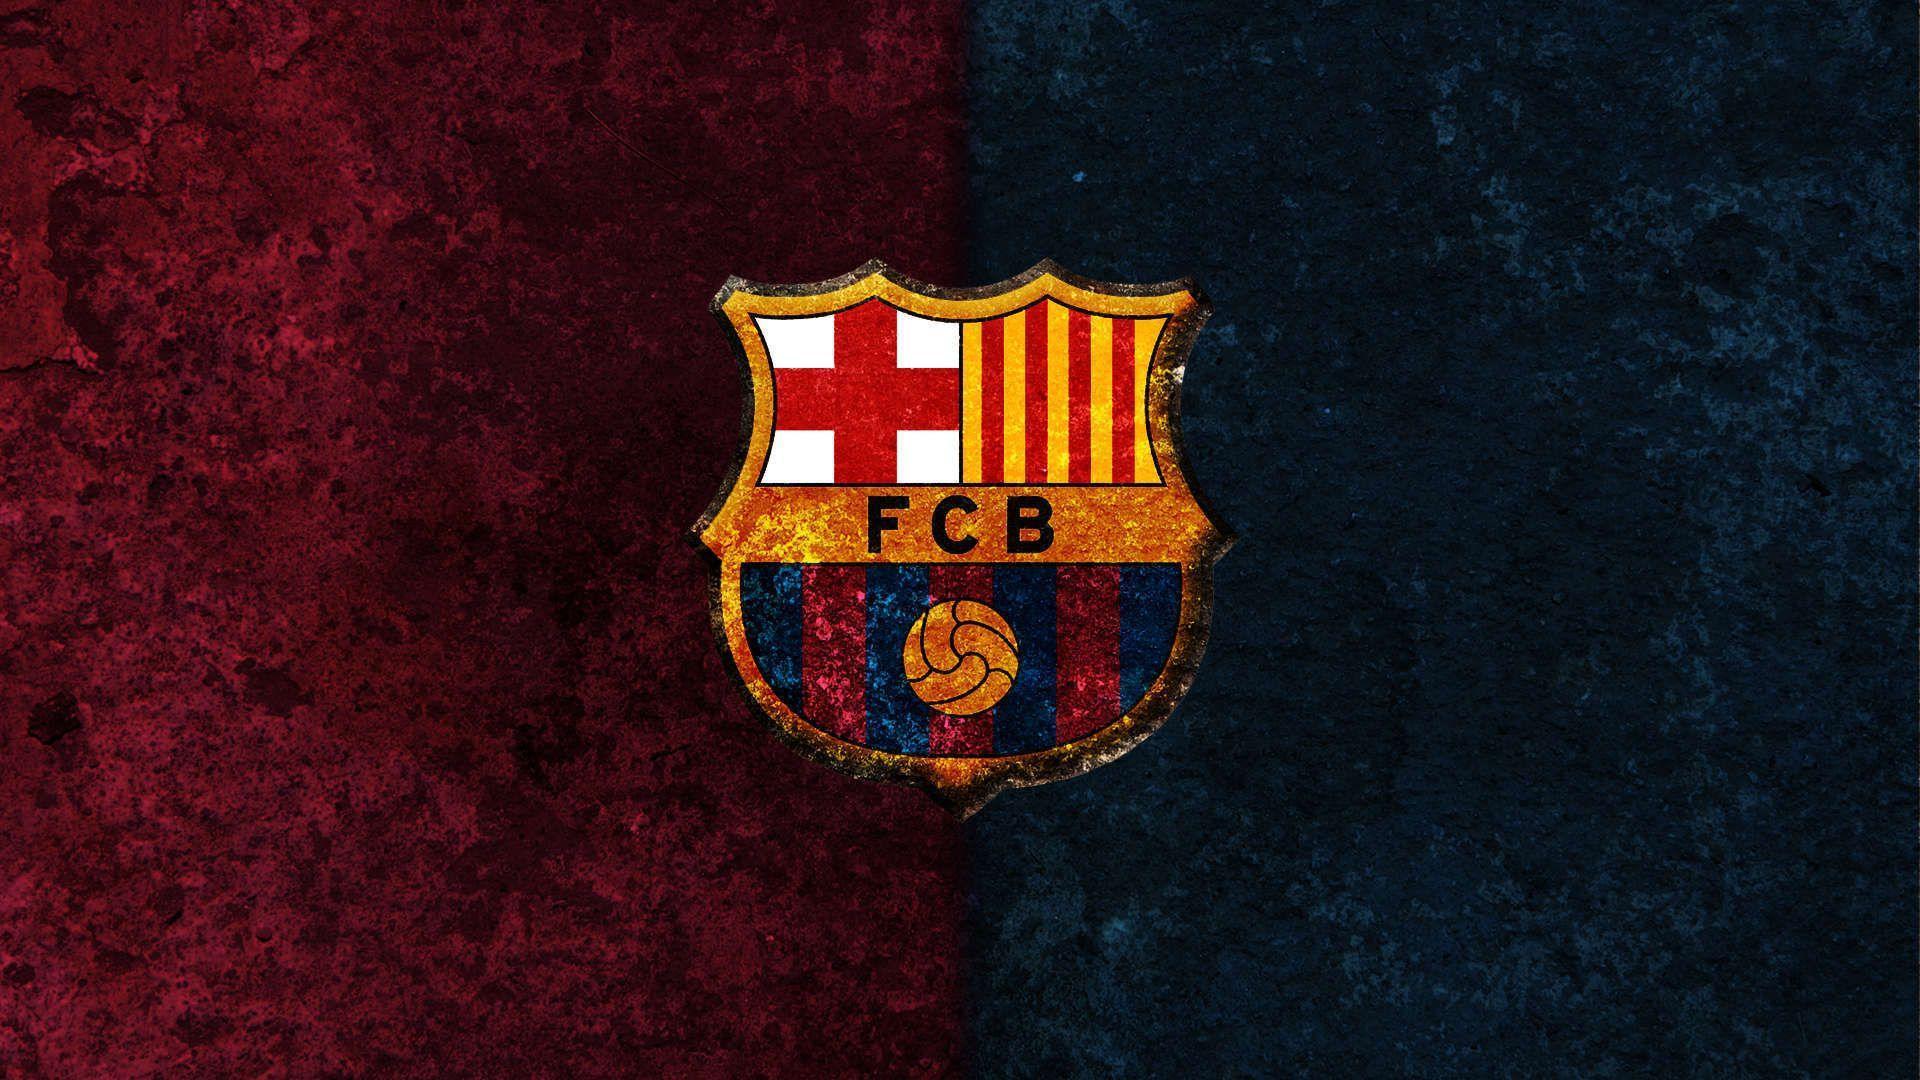 FC Barcelona Wallpapers 2016 1920x1080